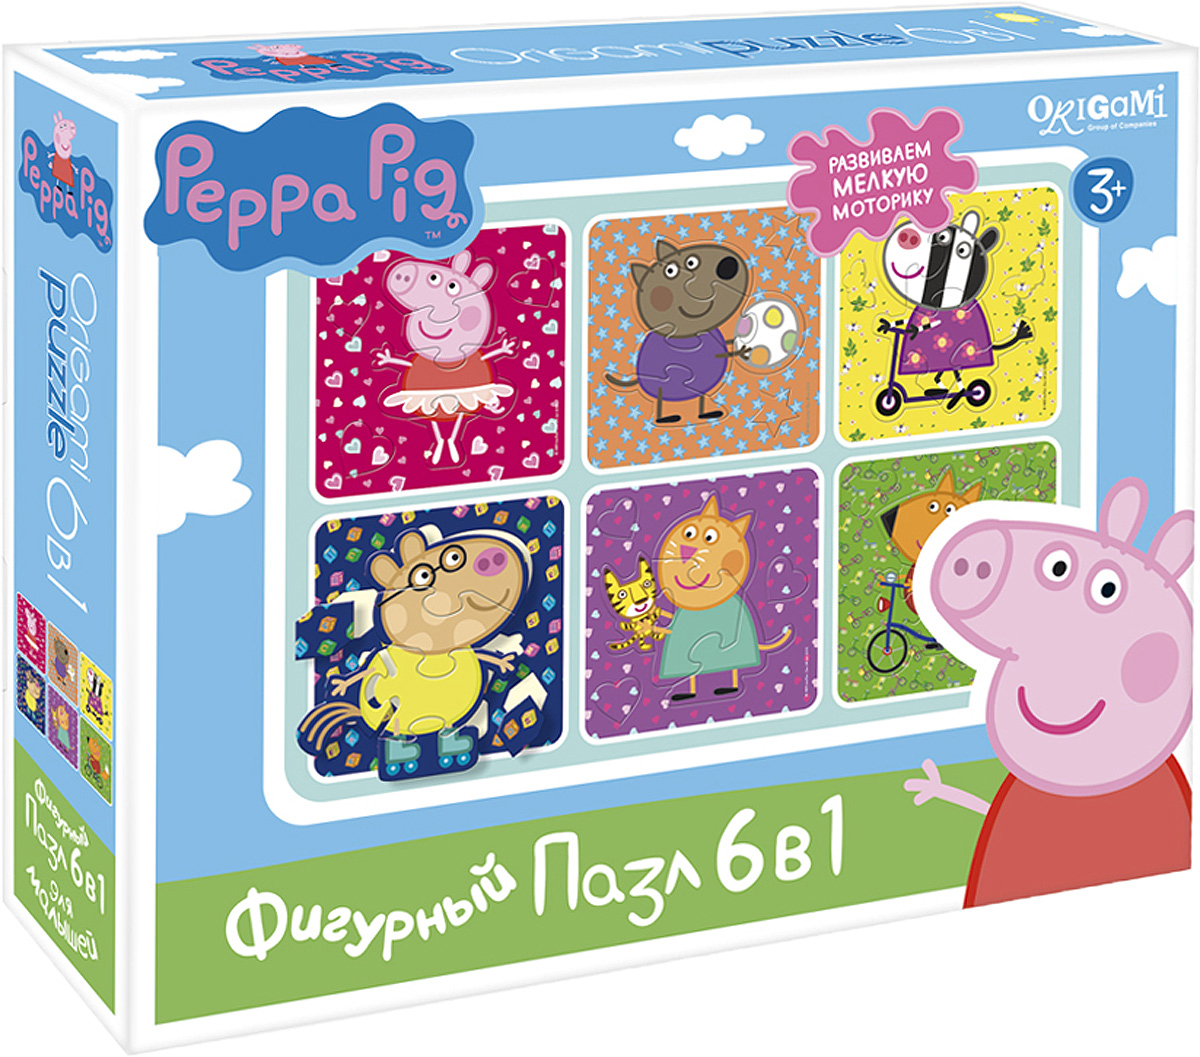 Peppa Pig Пазл для малышей Хобби 6 в 1 пазл origami 01569 peppa pig 24эл